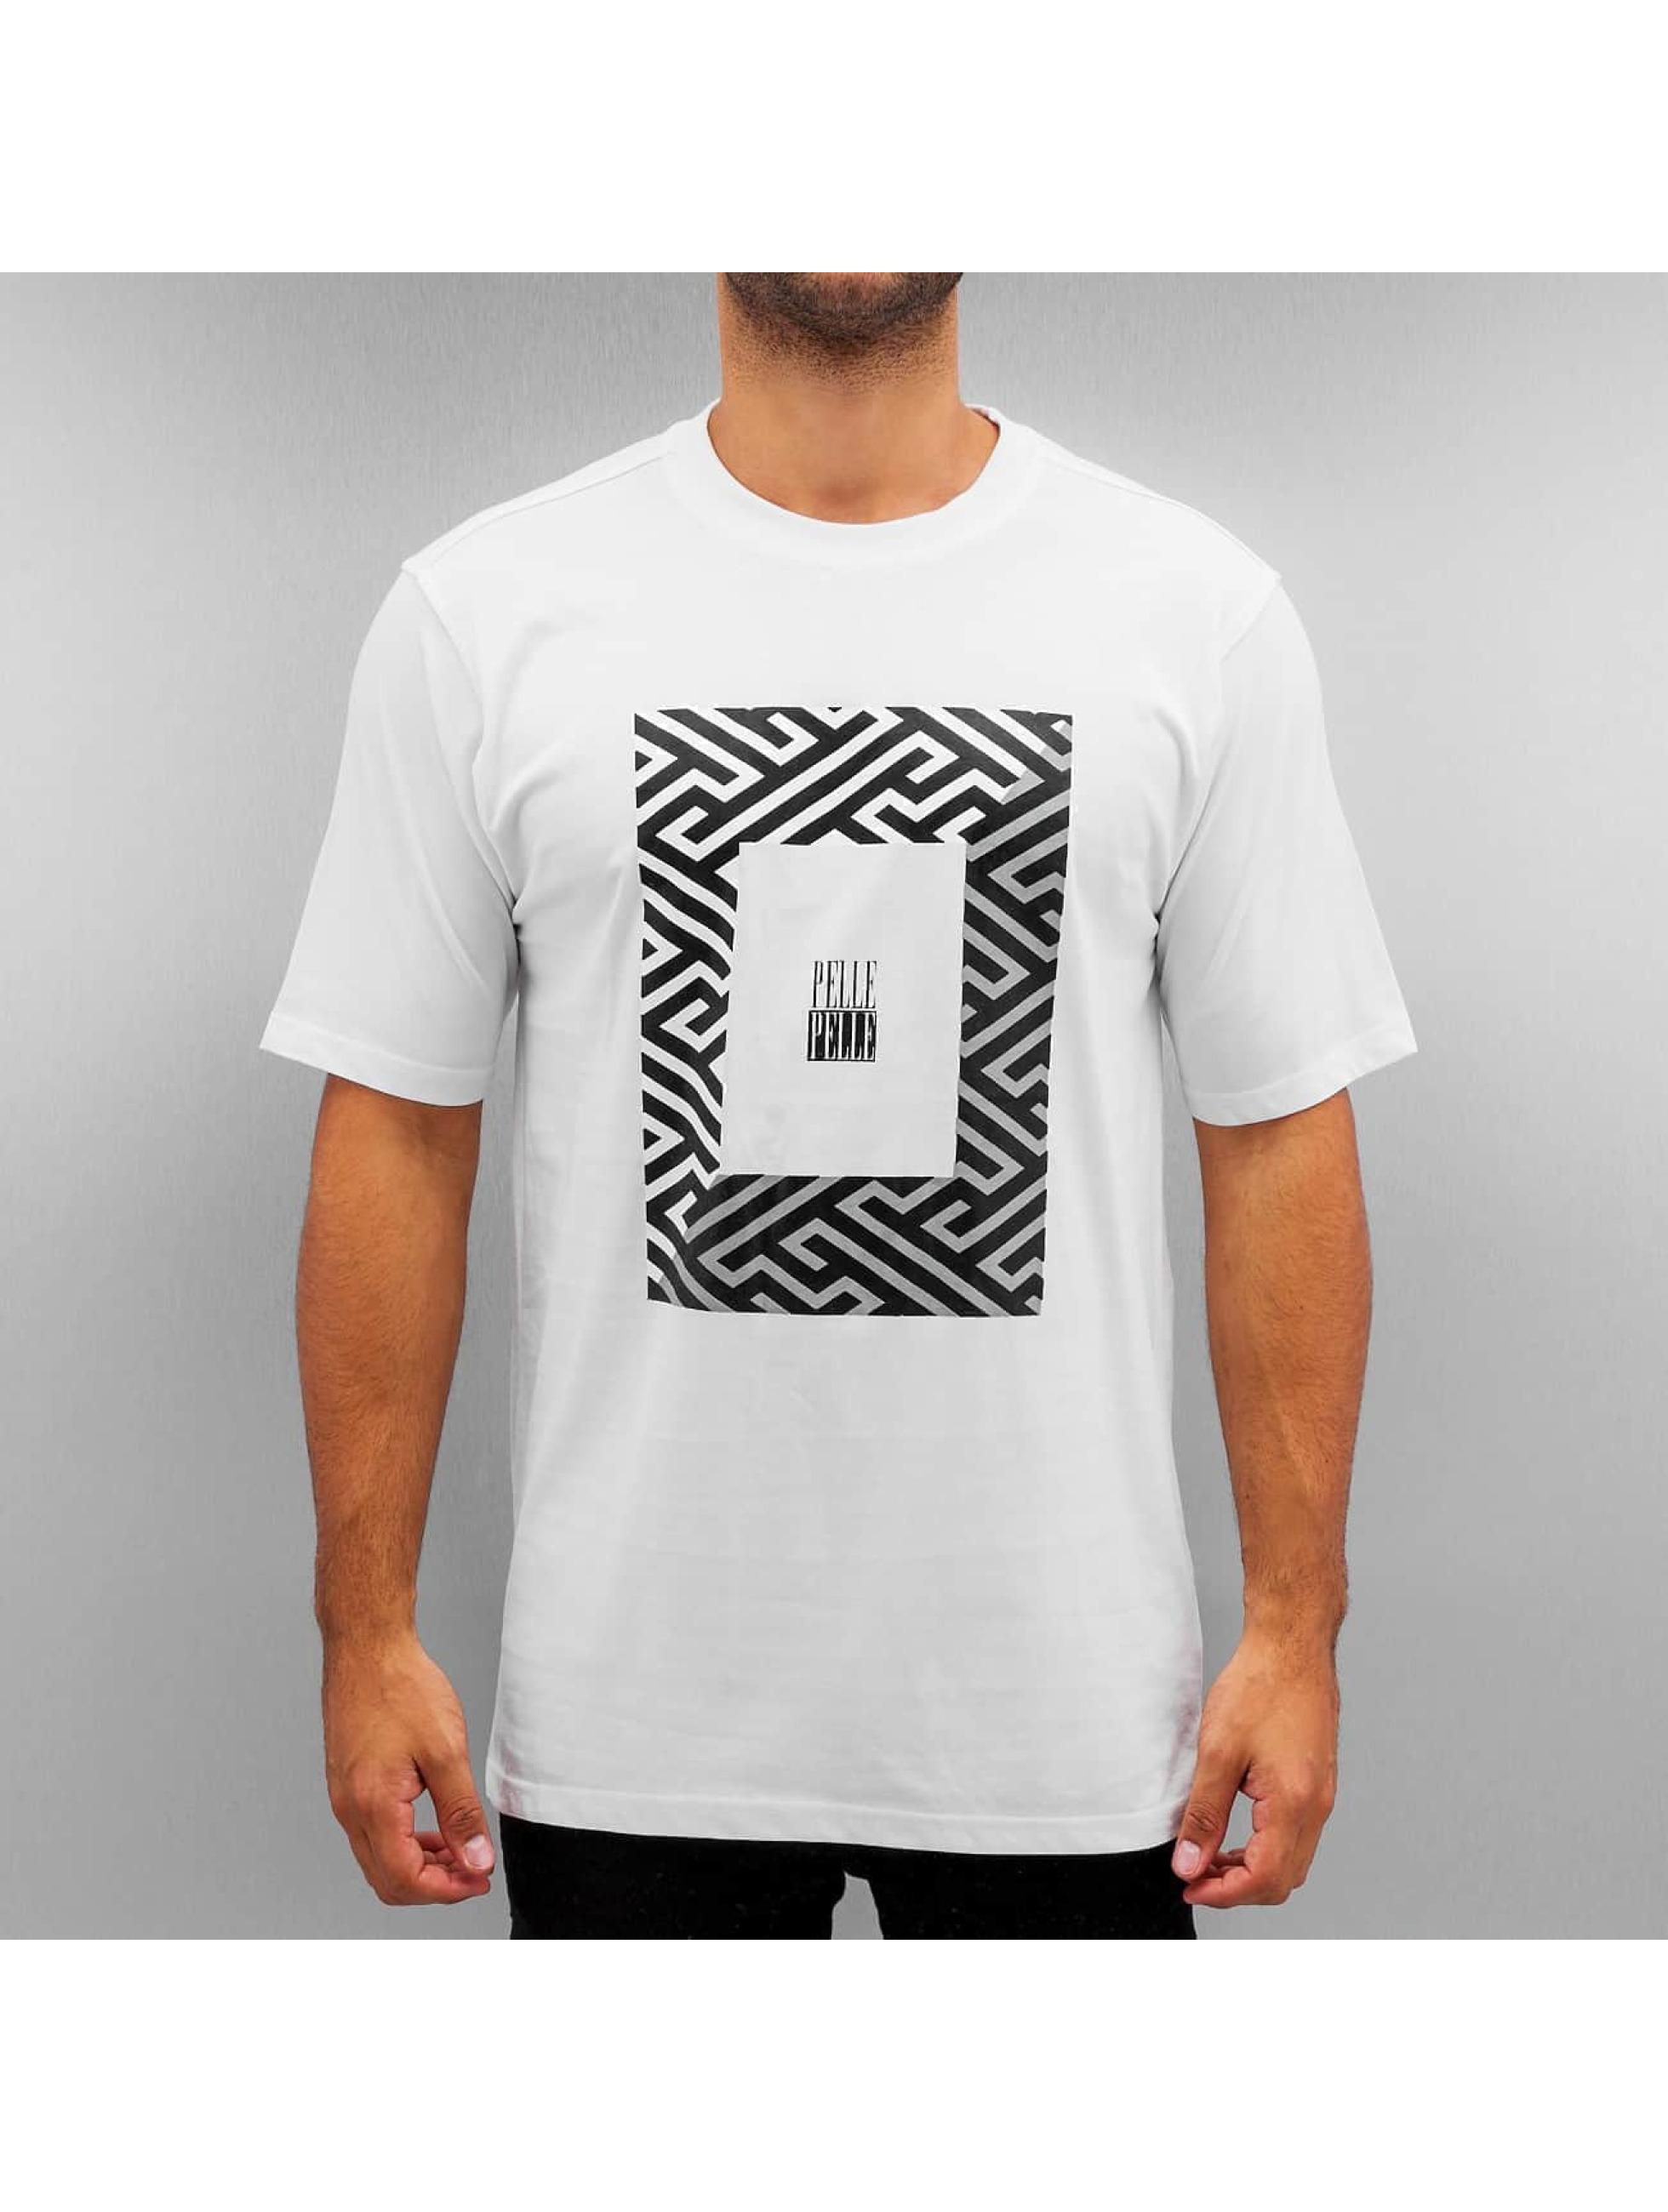 Pelle Pelle t-shirt 50/50 Dark Maze wit